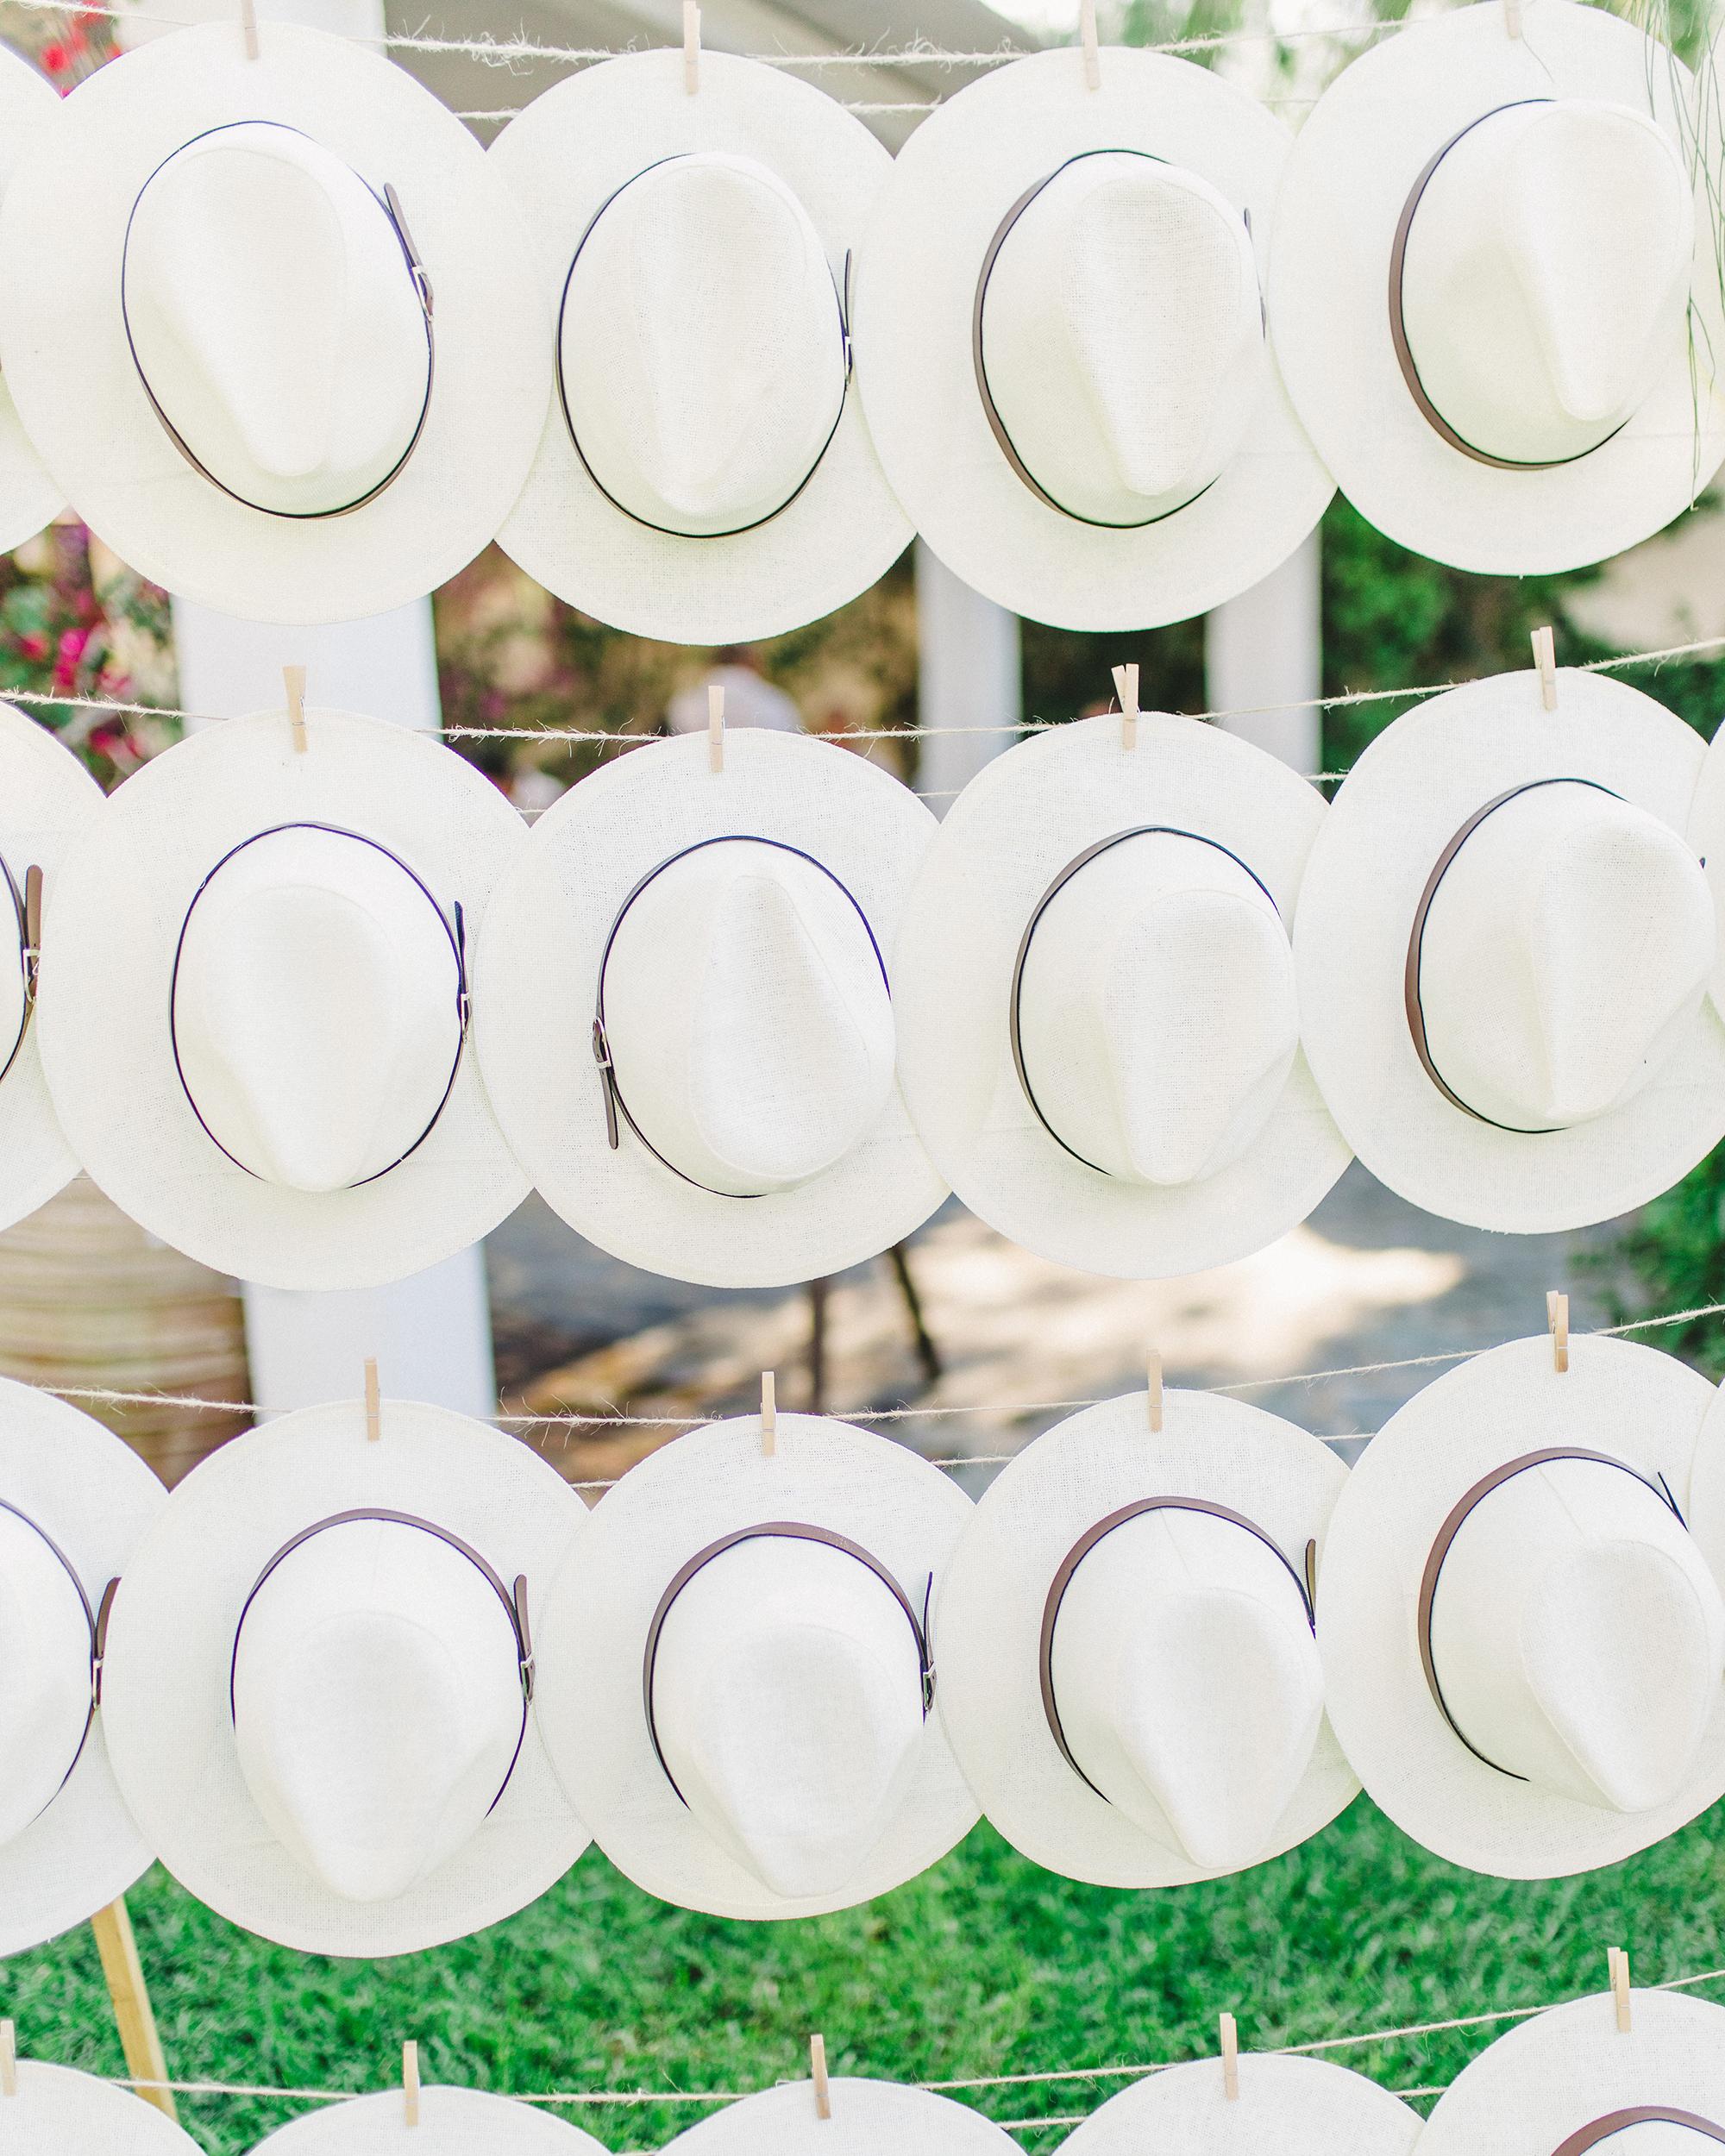 sun hats on clothes line